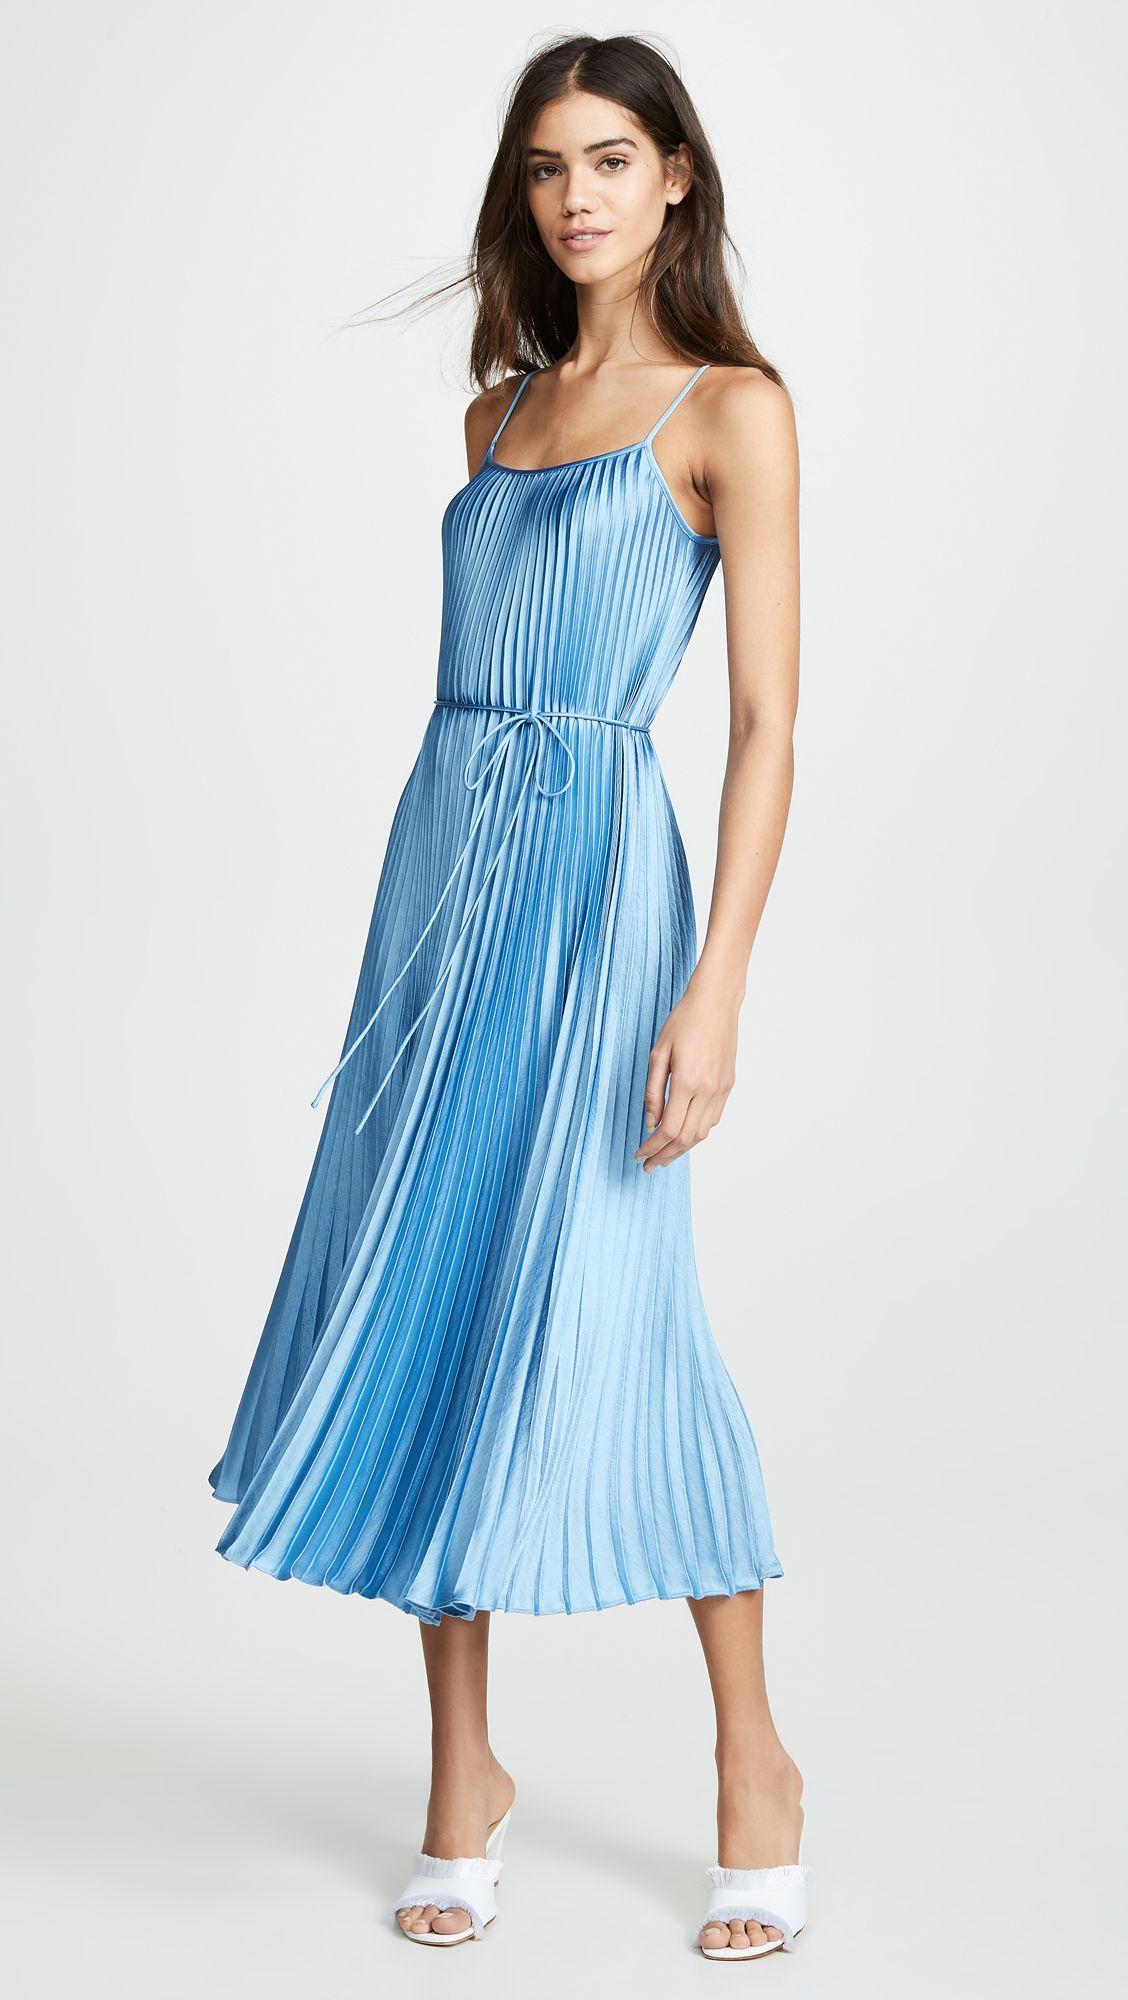 Vince Pleated Cami Dress Wrap Over Dress Necklines For Dresses Dresses [ 2000 x 1128 Pixel ]